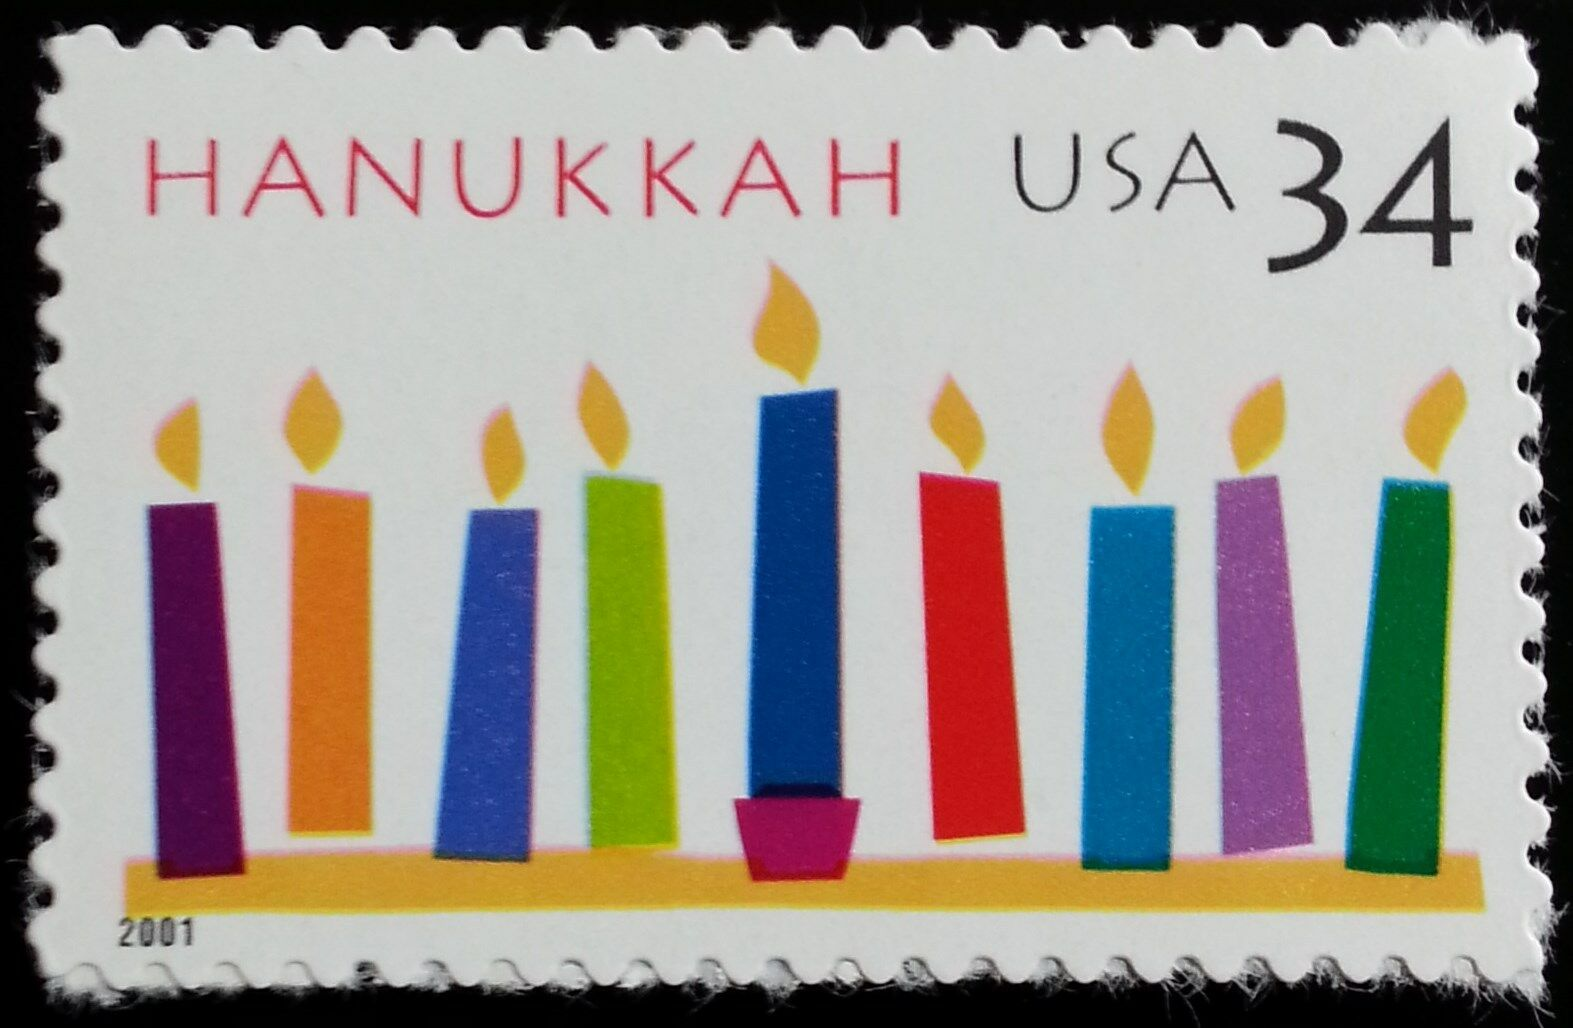 2001 34c Hanukkah, Festival of Lights Scott 3547 Mint F